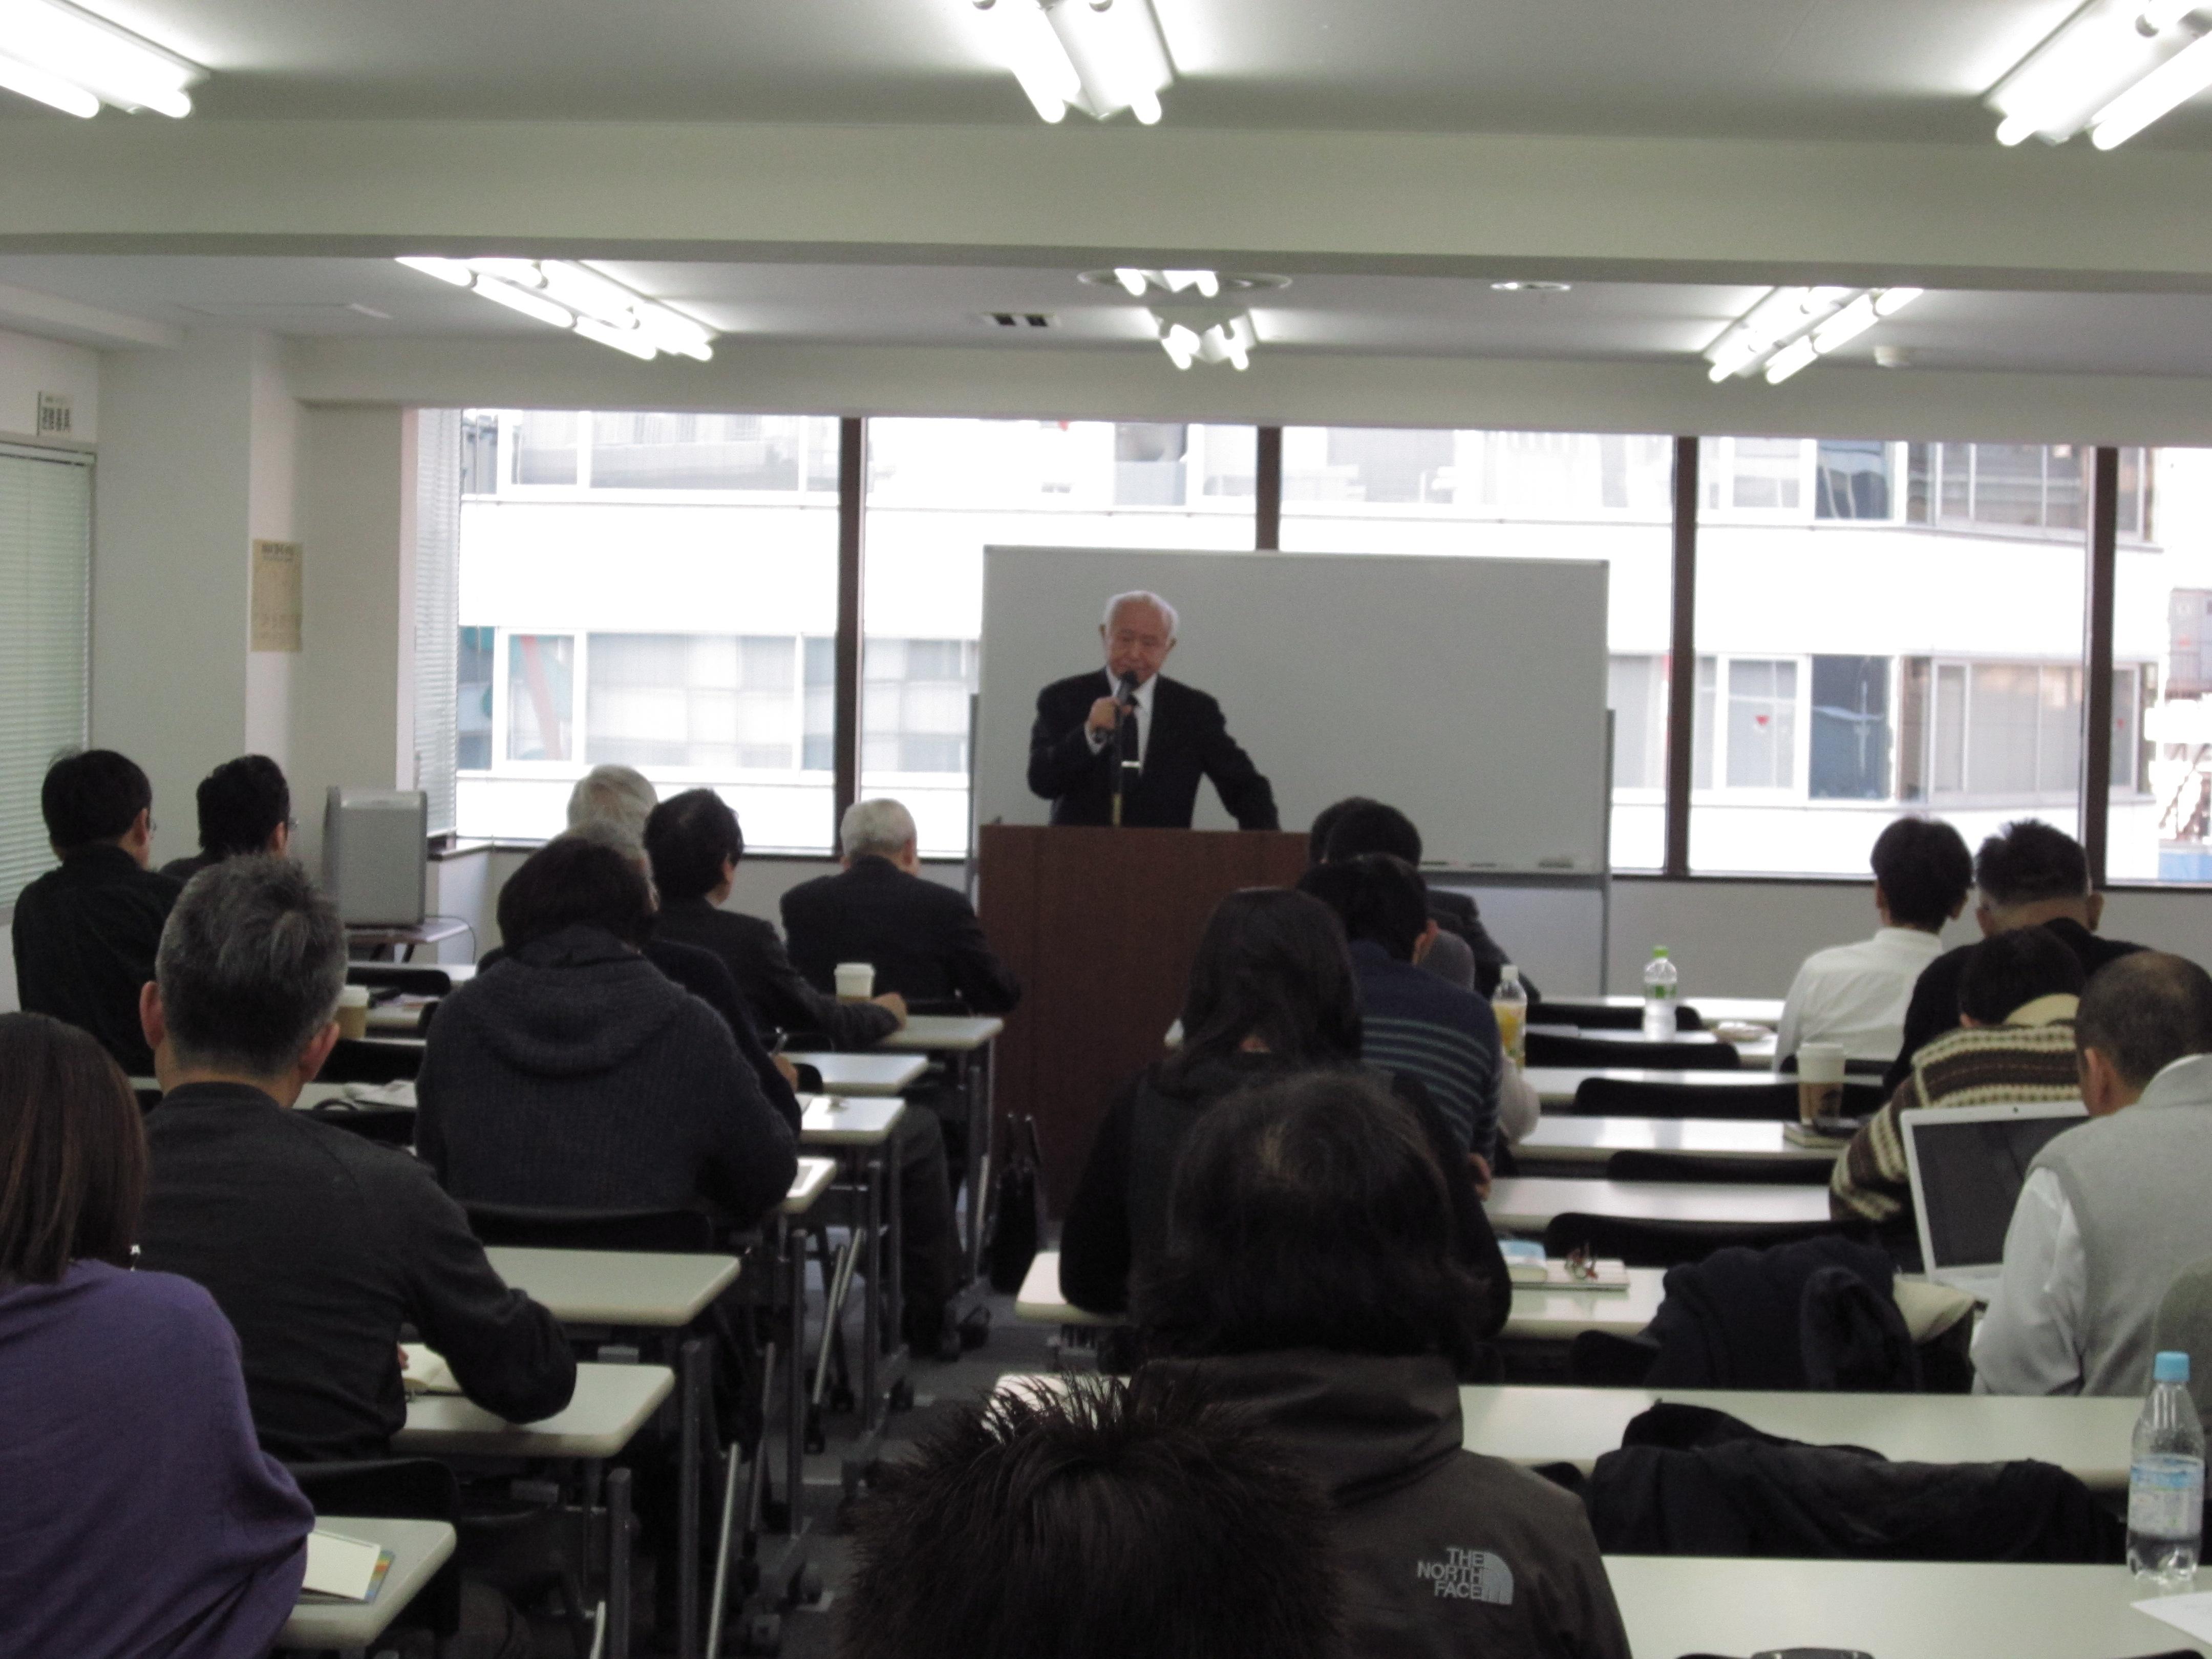 IMG 5612 - 4月1日東京思風塾の開催になります。